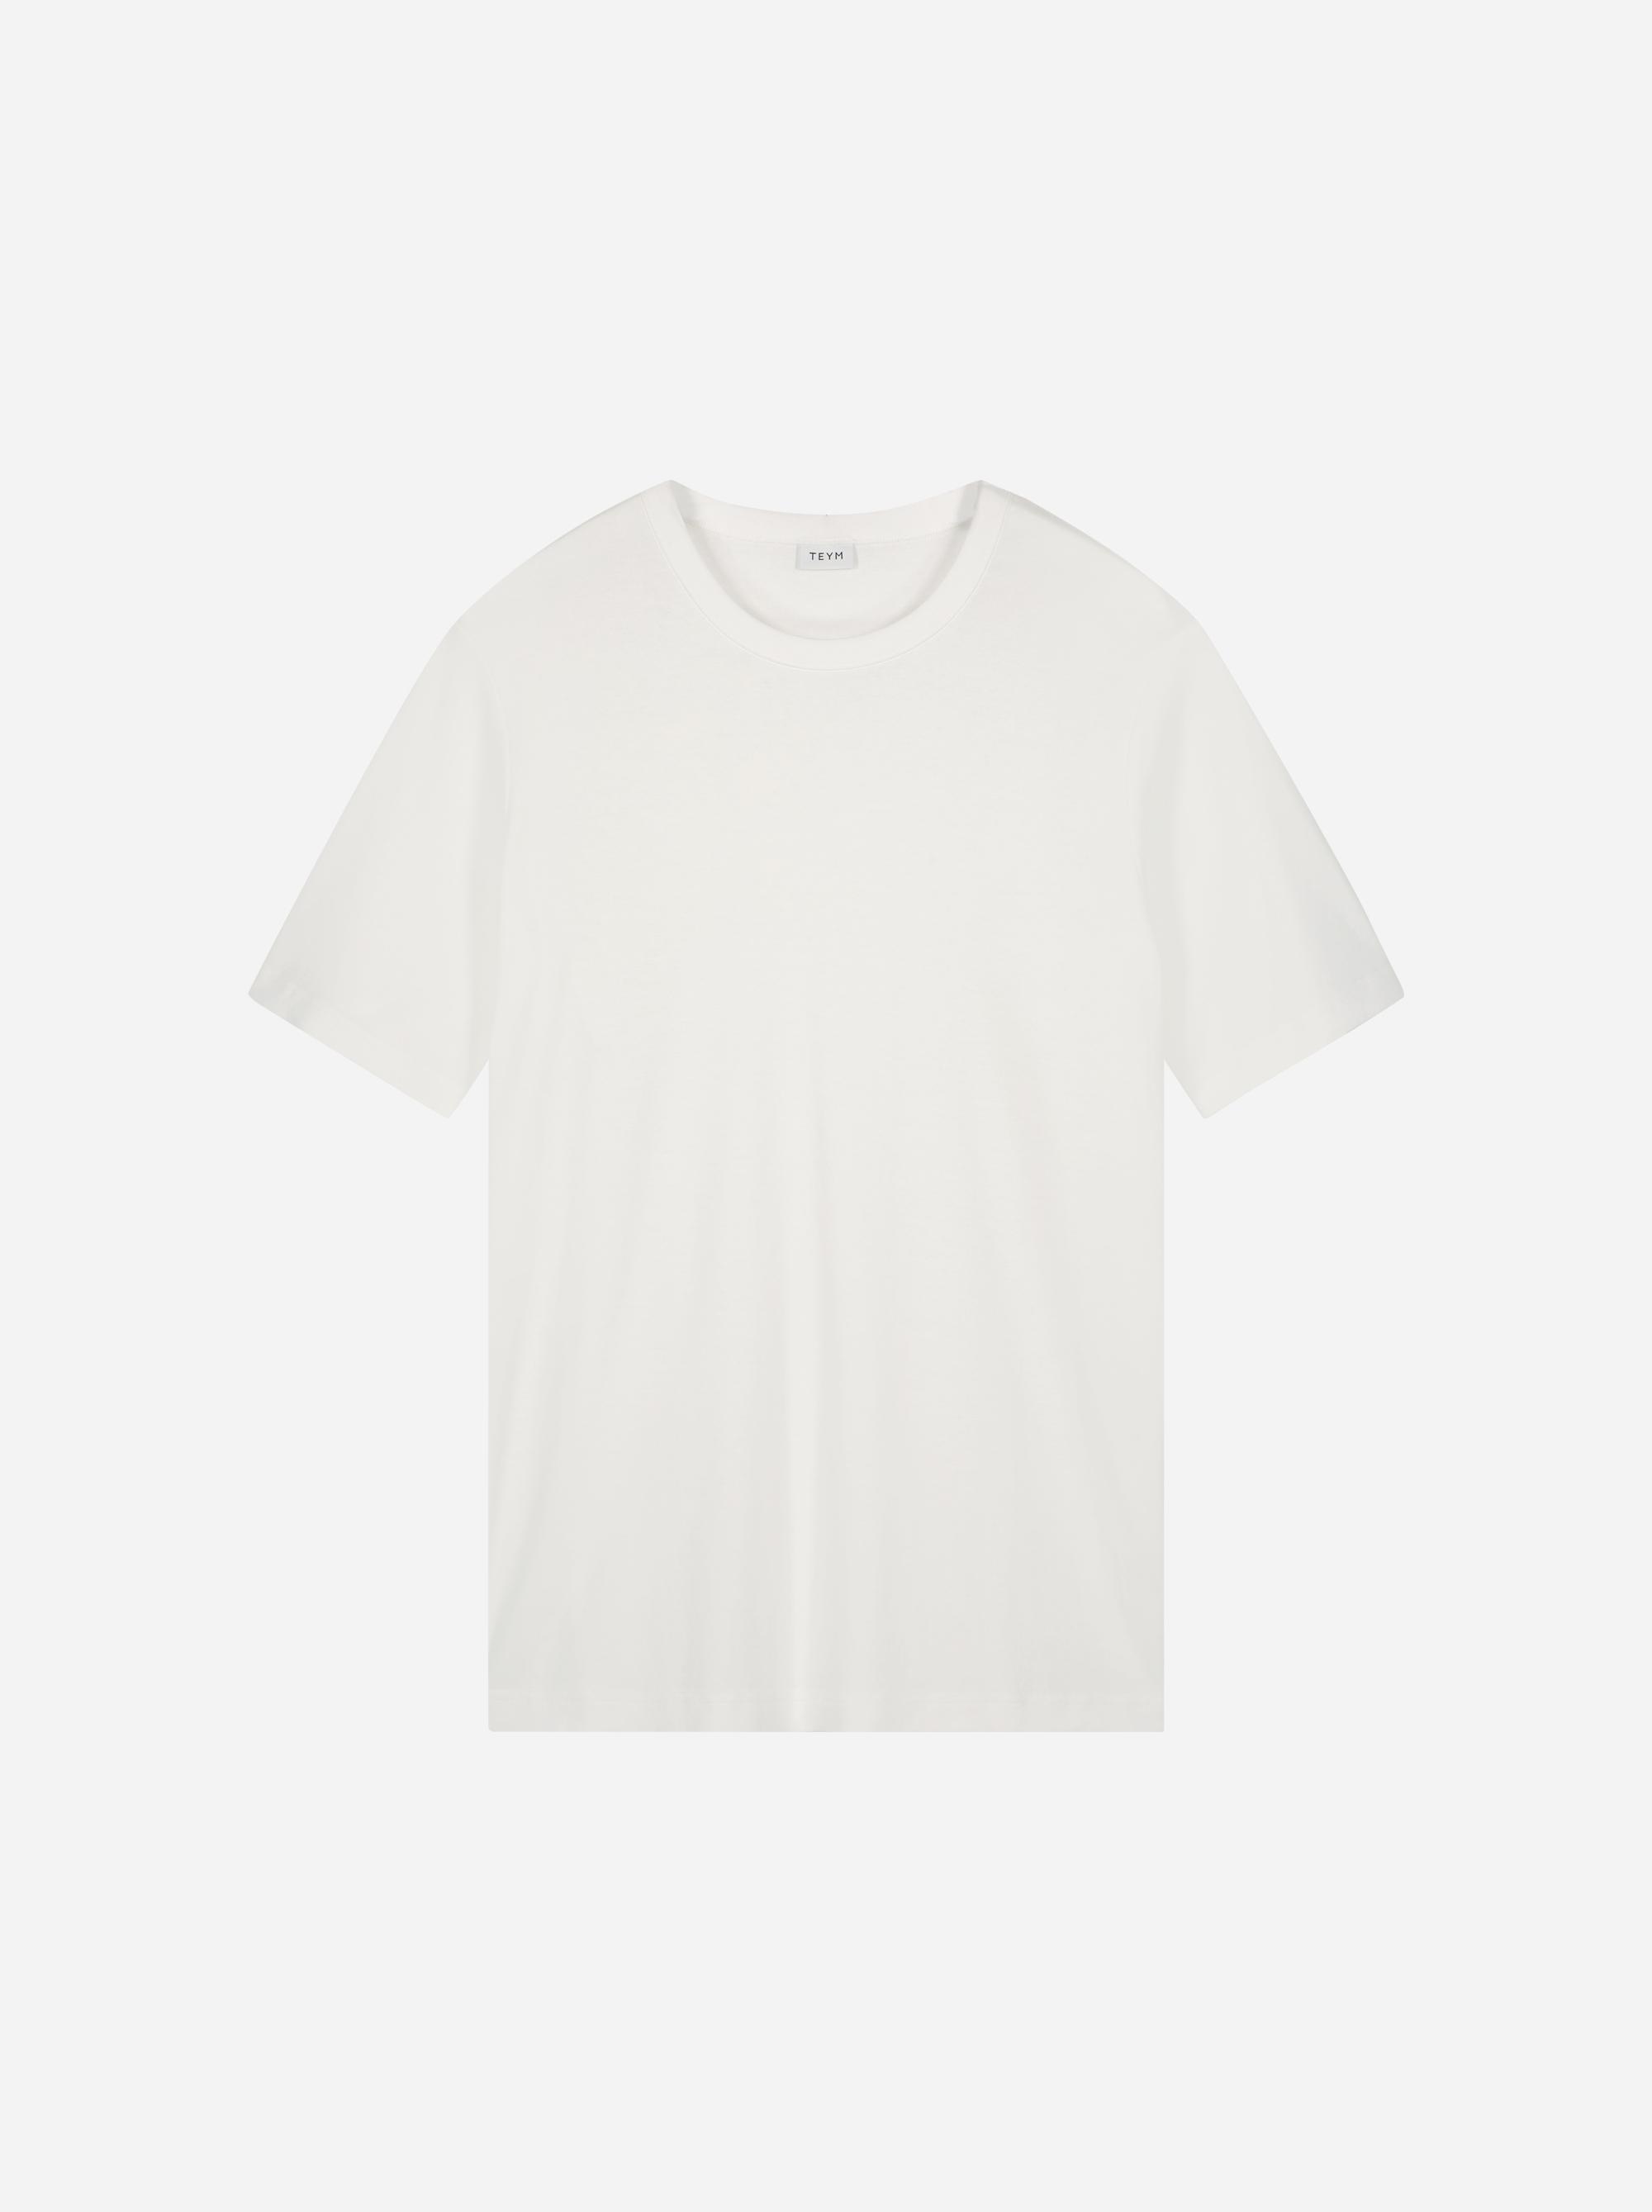 Teym - The-T-Shirt - Men - White - 5